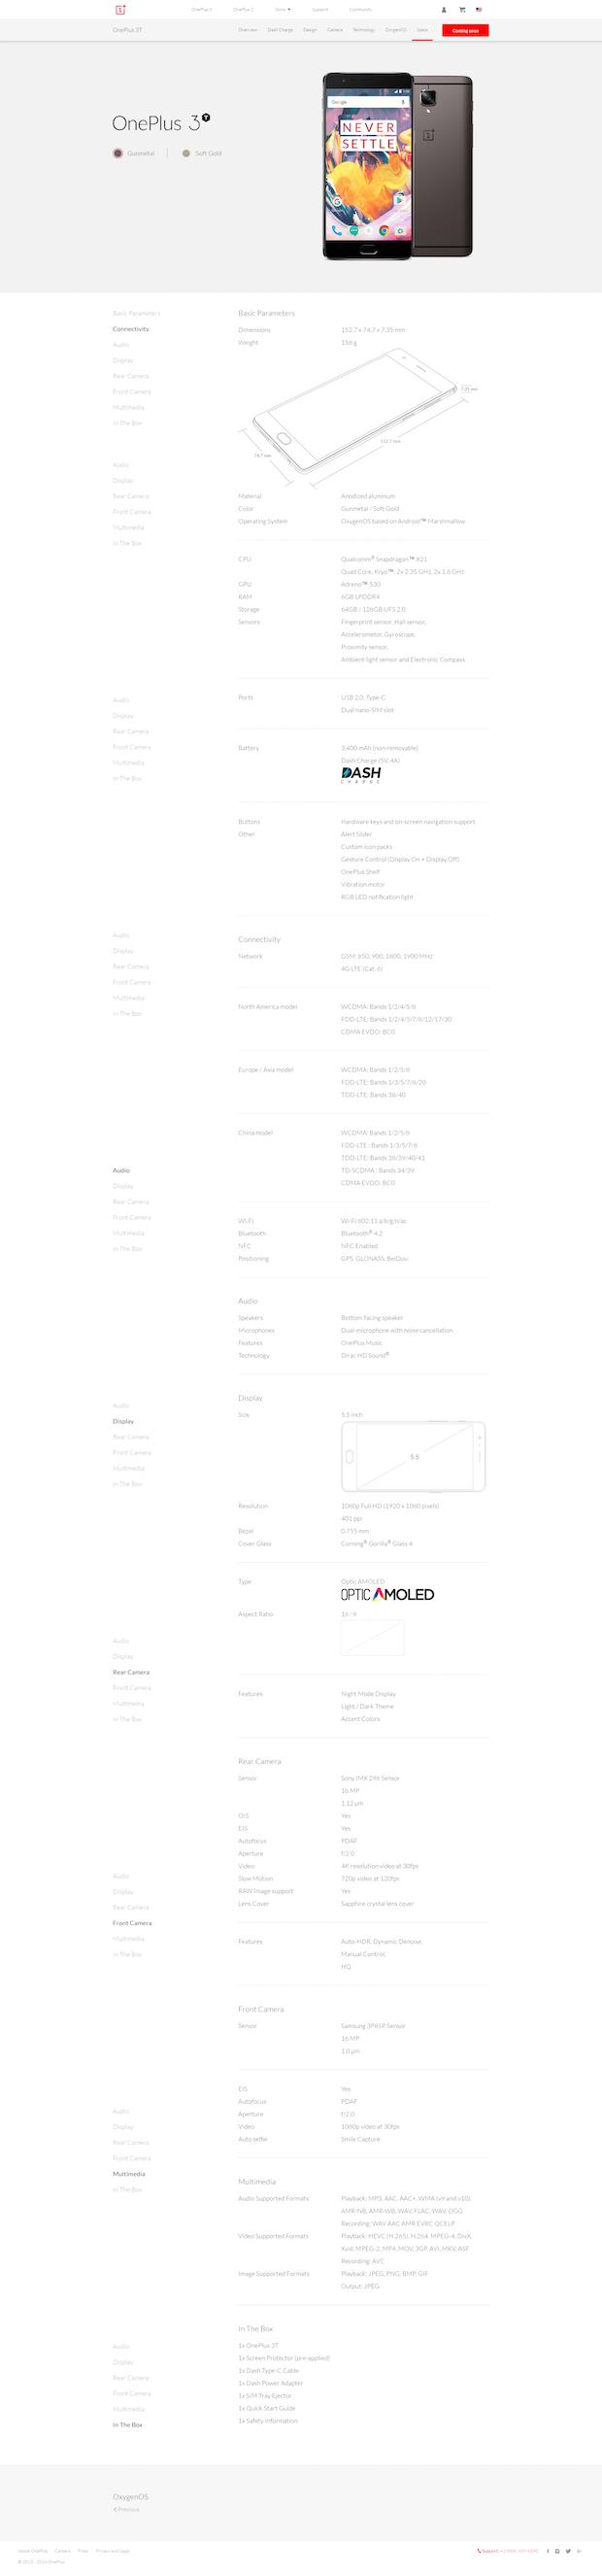 OnePlus 3T speksit